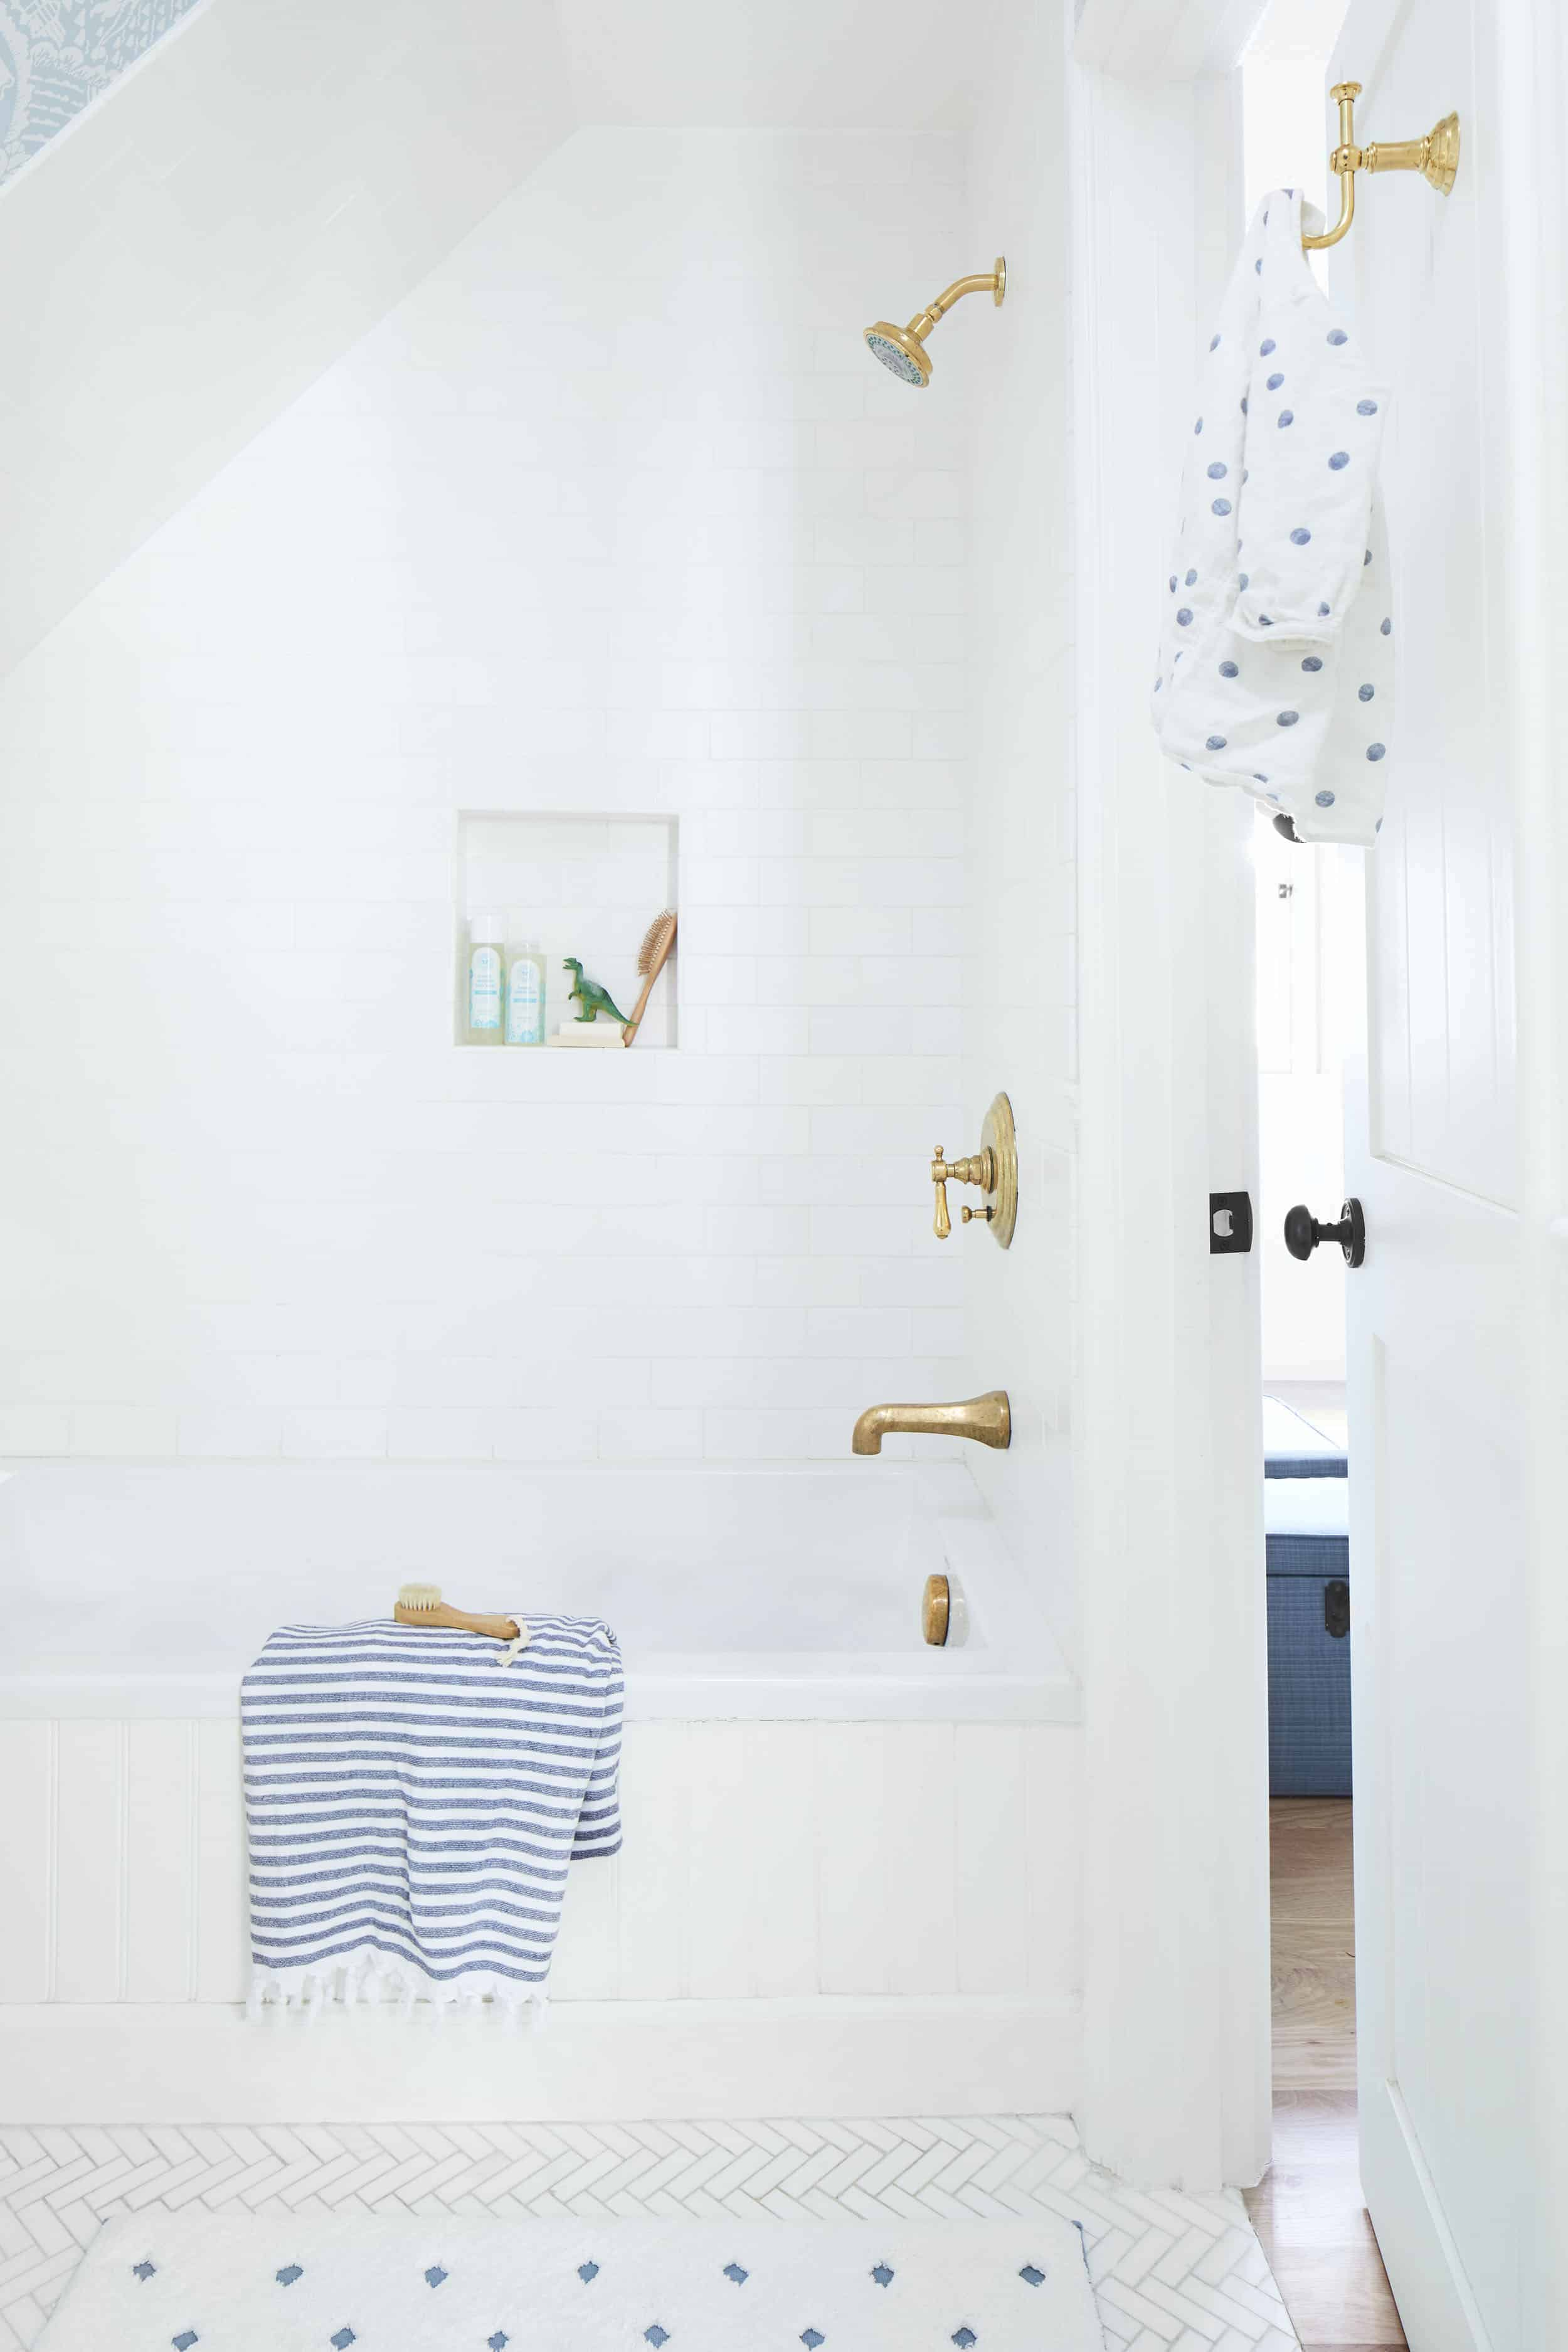 Kids Tiled Shower Tub Gold Bathroom Fixtures Herringbone Tile